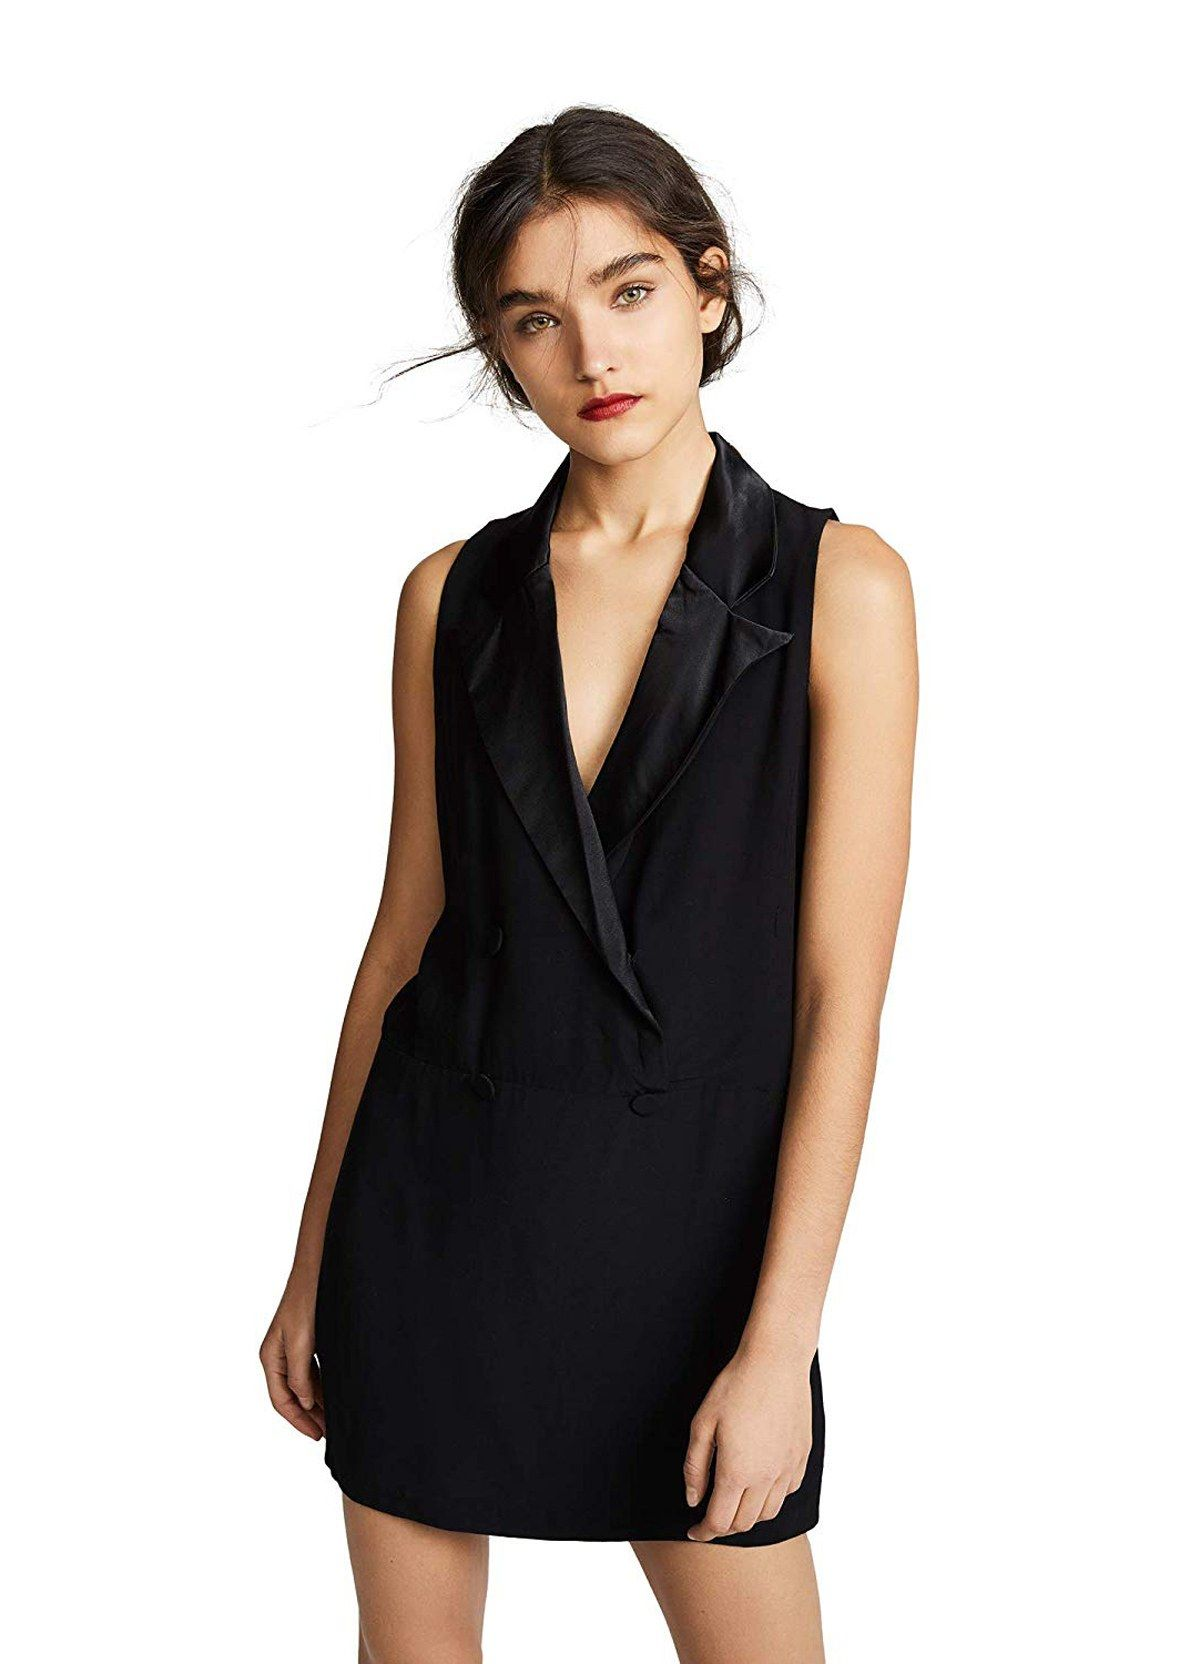 b3e26d2f06a The Meghan Markle Guide to Tuxedo Dresses | Polyvore | Tuxedo dress ...